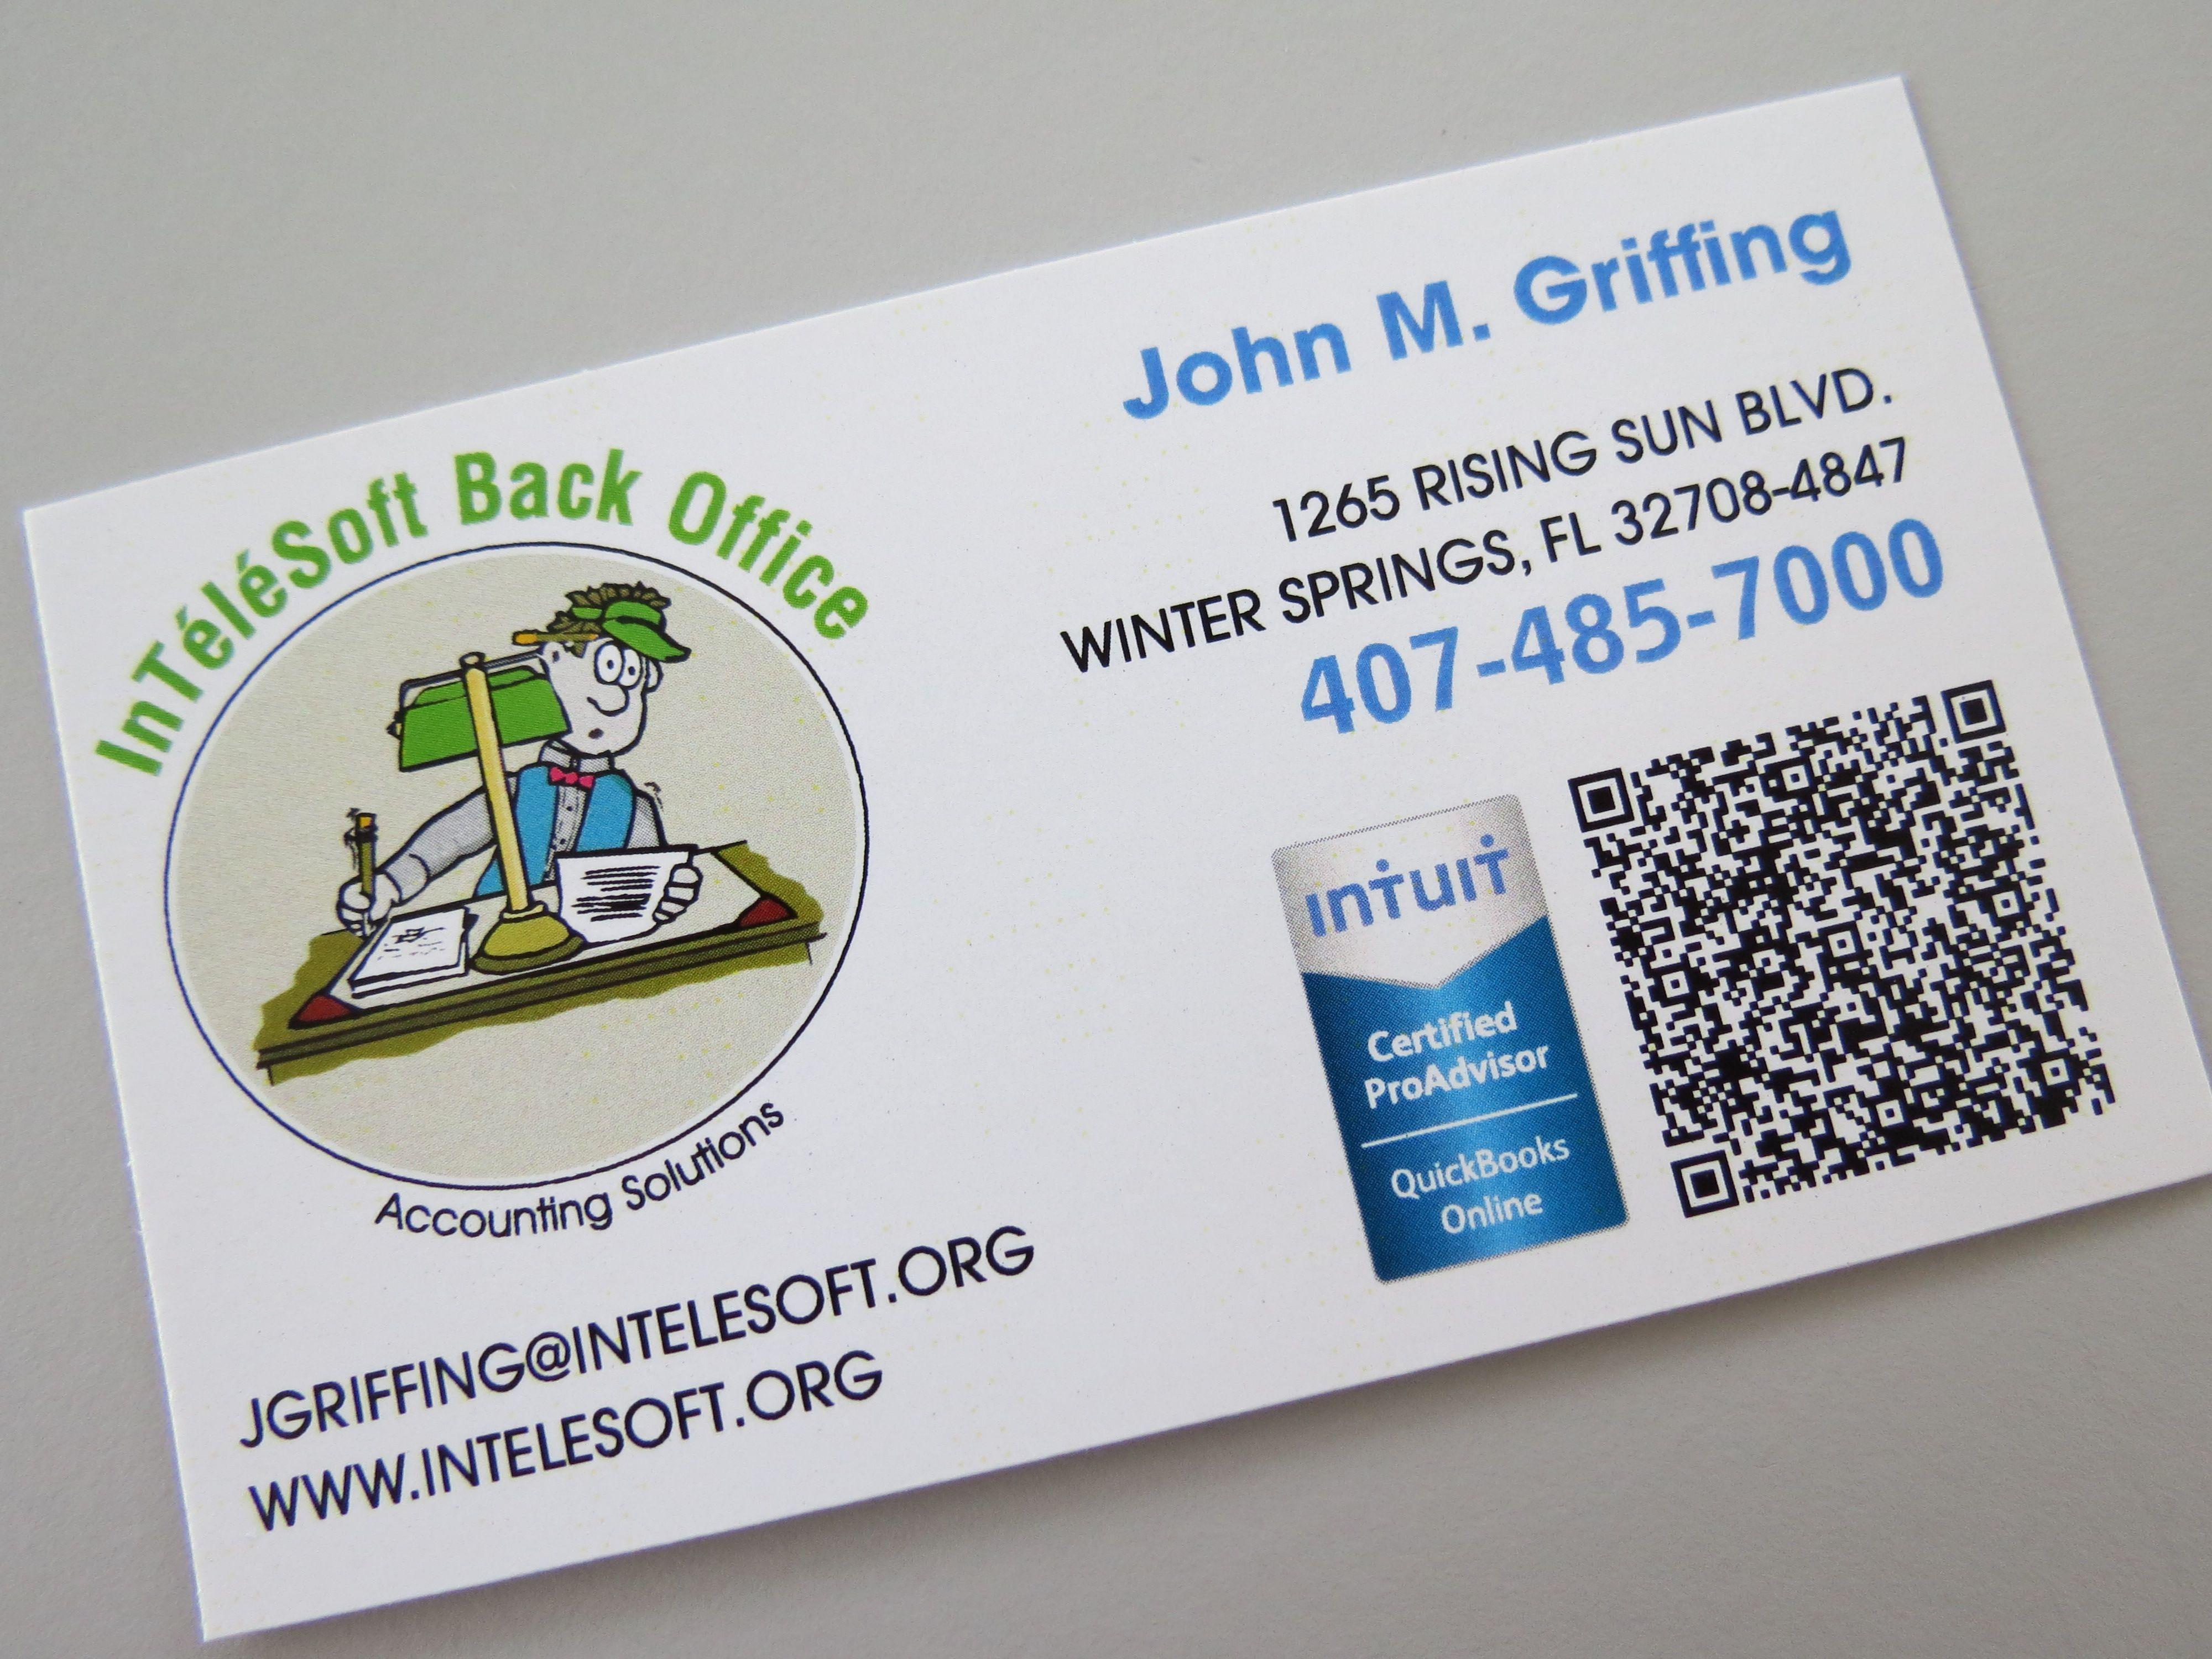 Business cards digital 1sided qr code wwwwinterpark